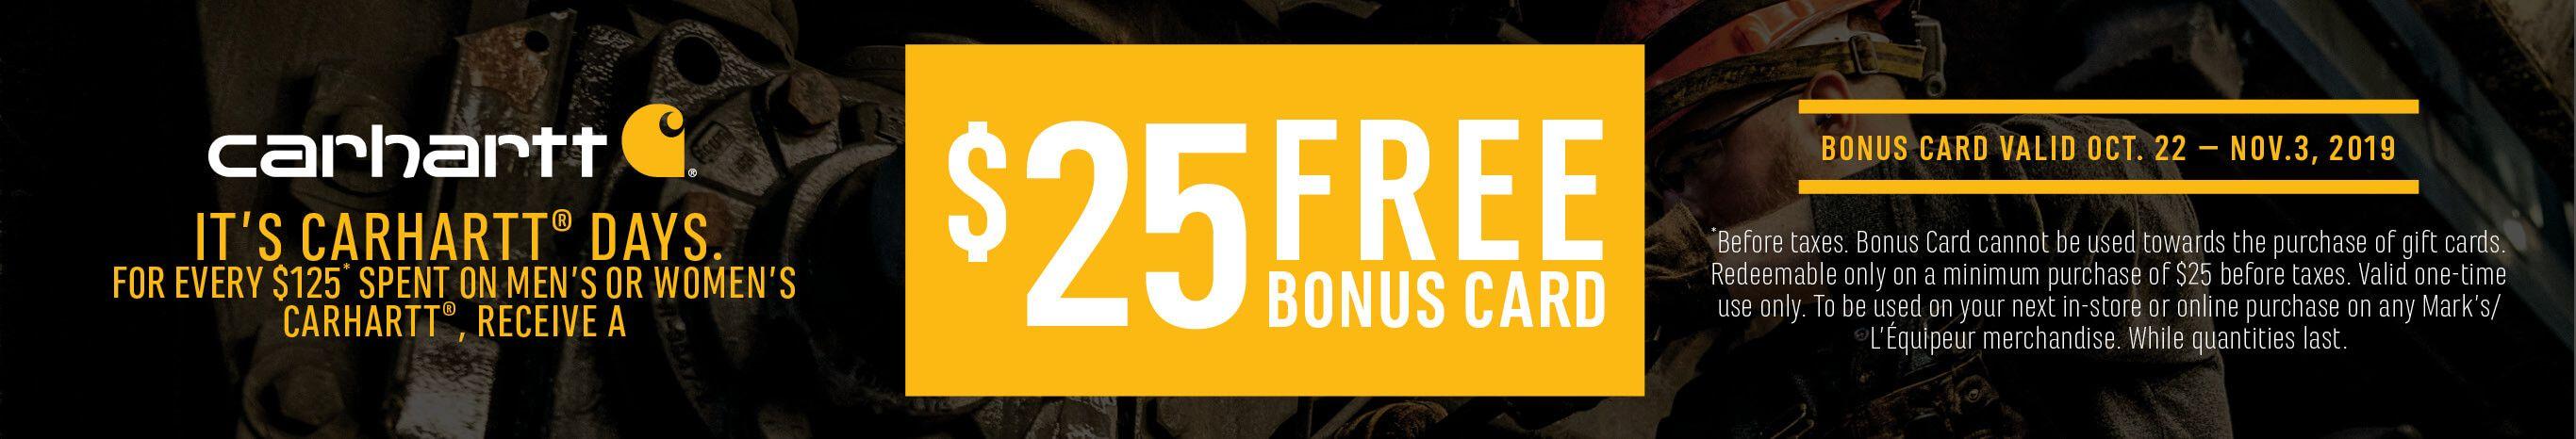 It's Carhartt Days. For Every $125 spent on men's or women's Carhartt, recieve a FREE $25 bonus card.